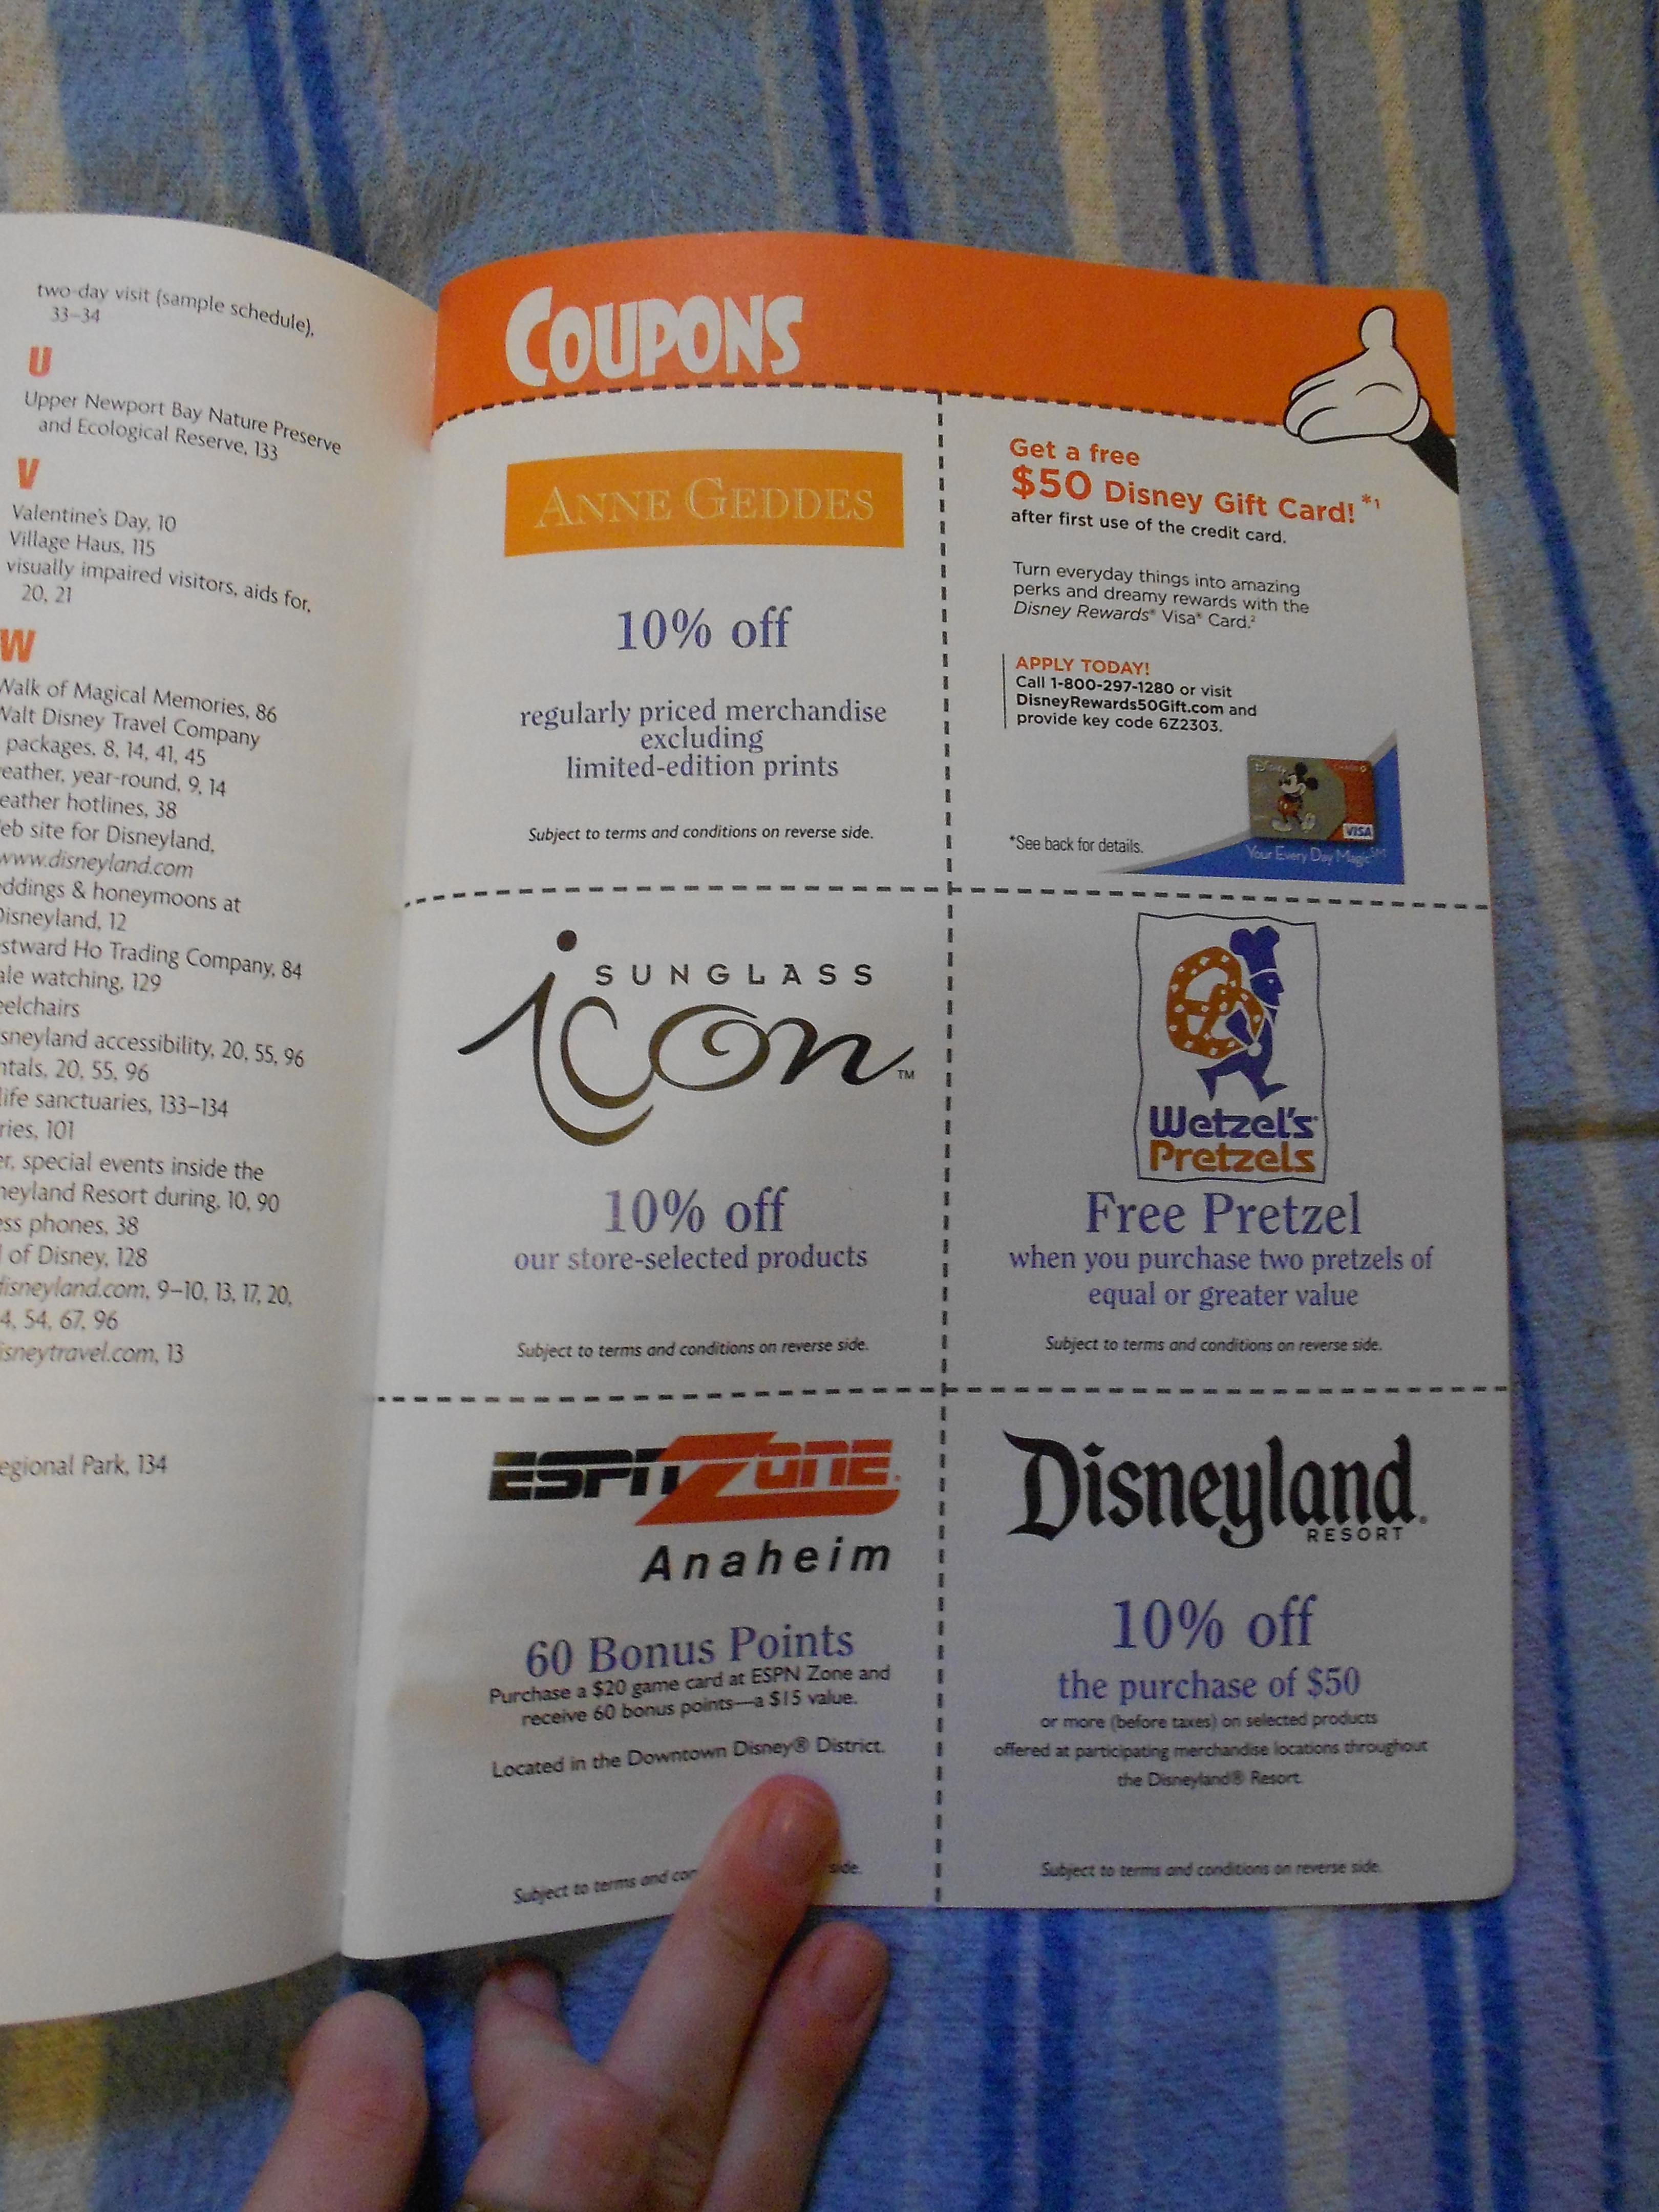 ... Birnbaum's Disneyland Resort 2011. Advertisements